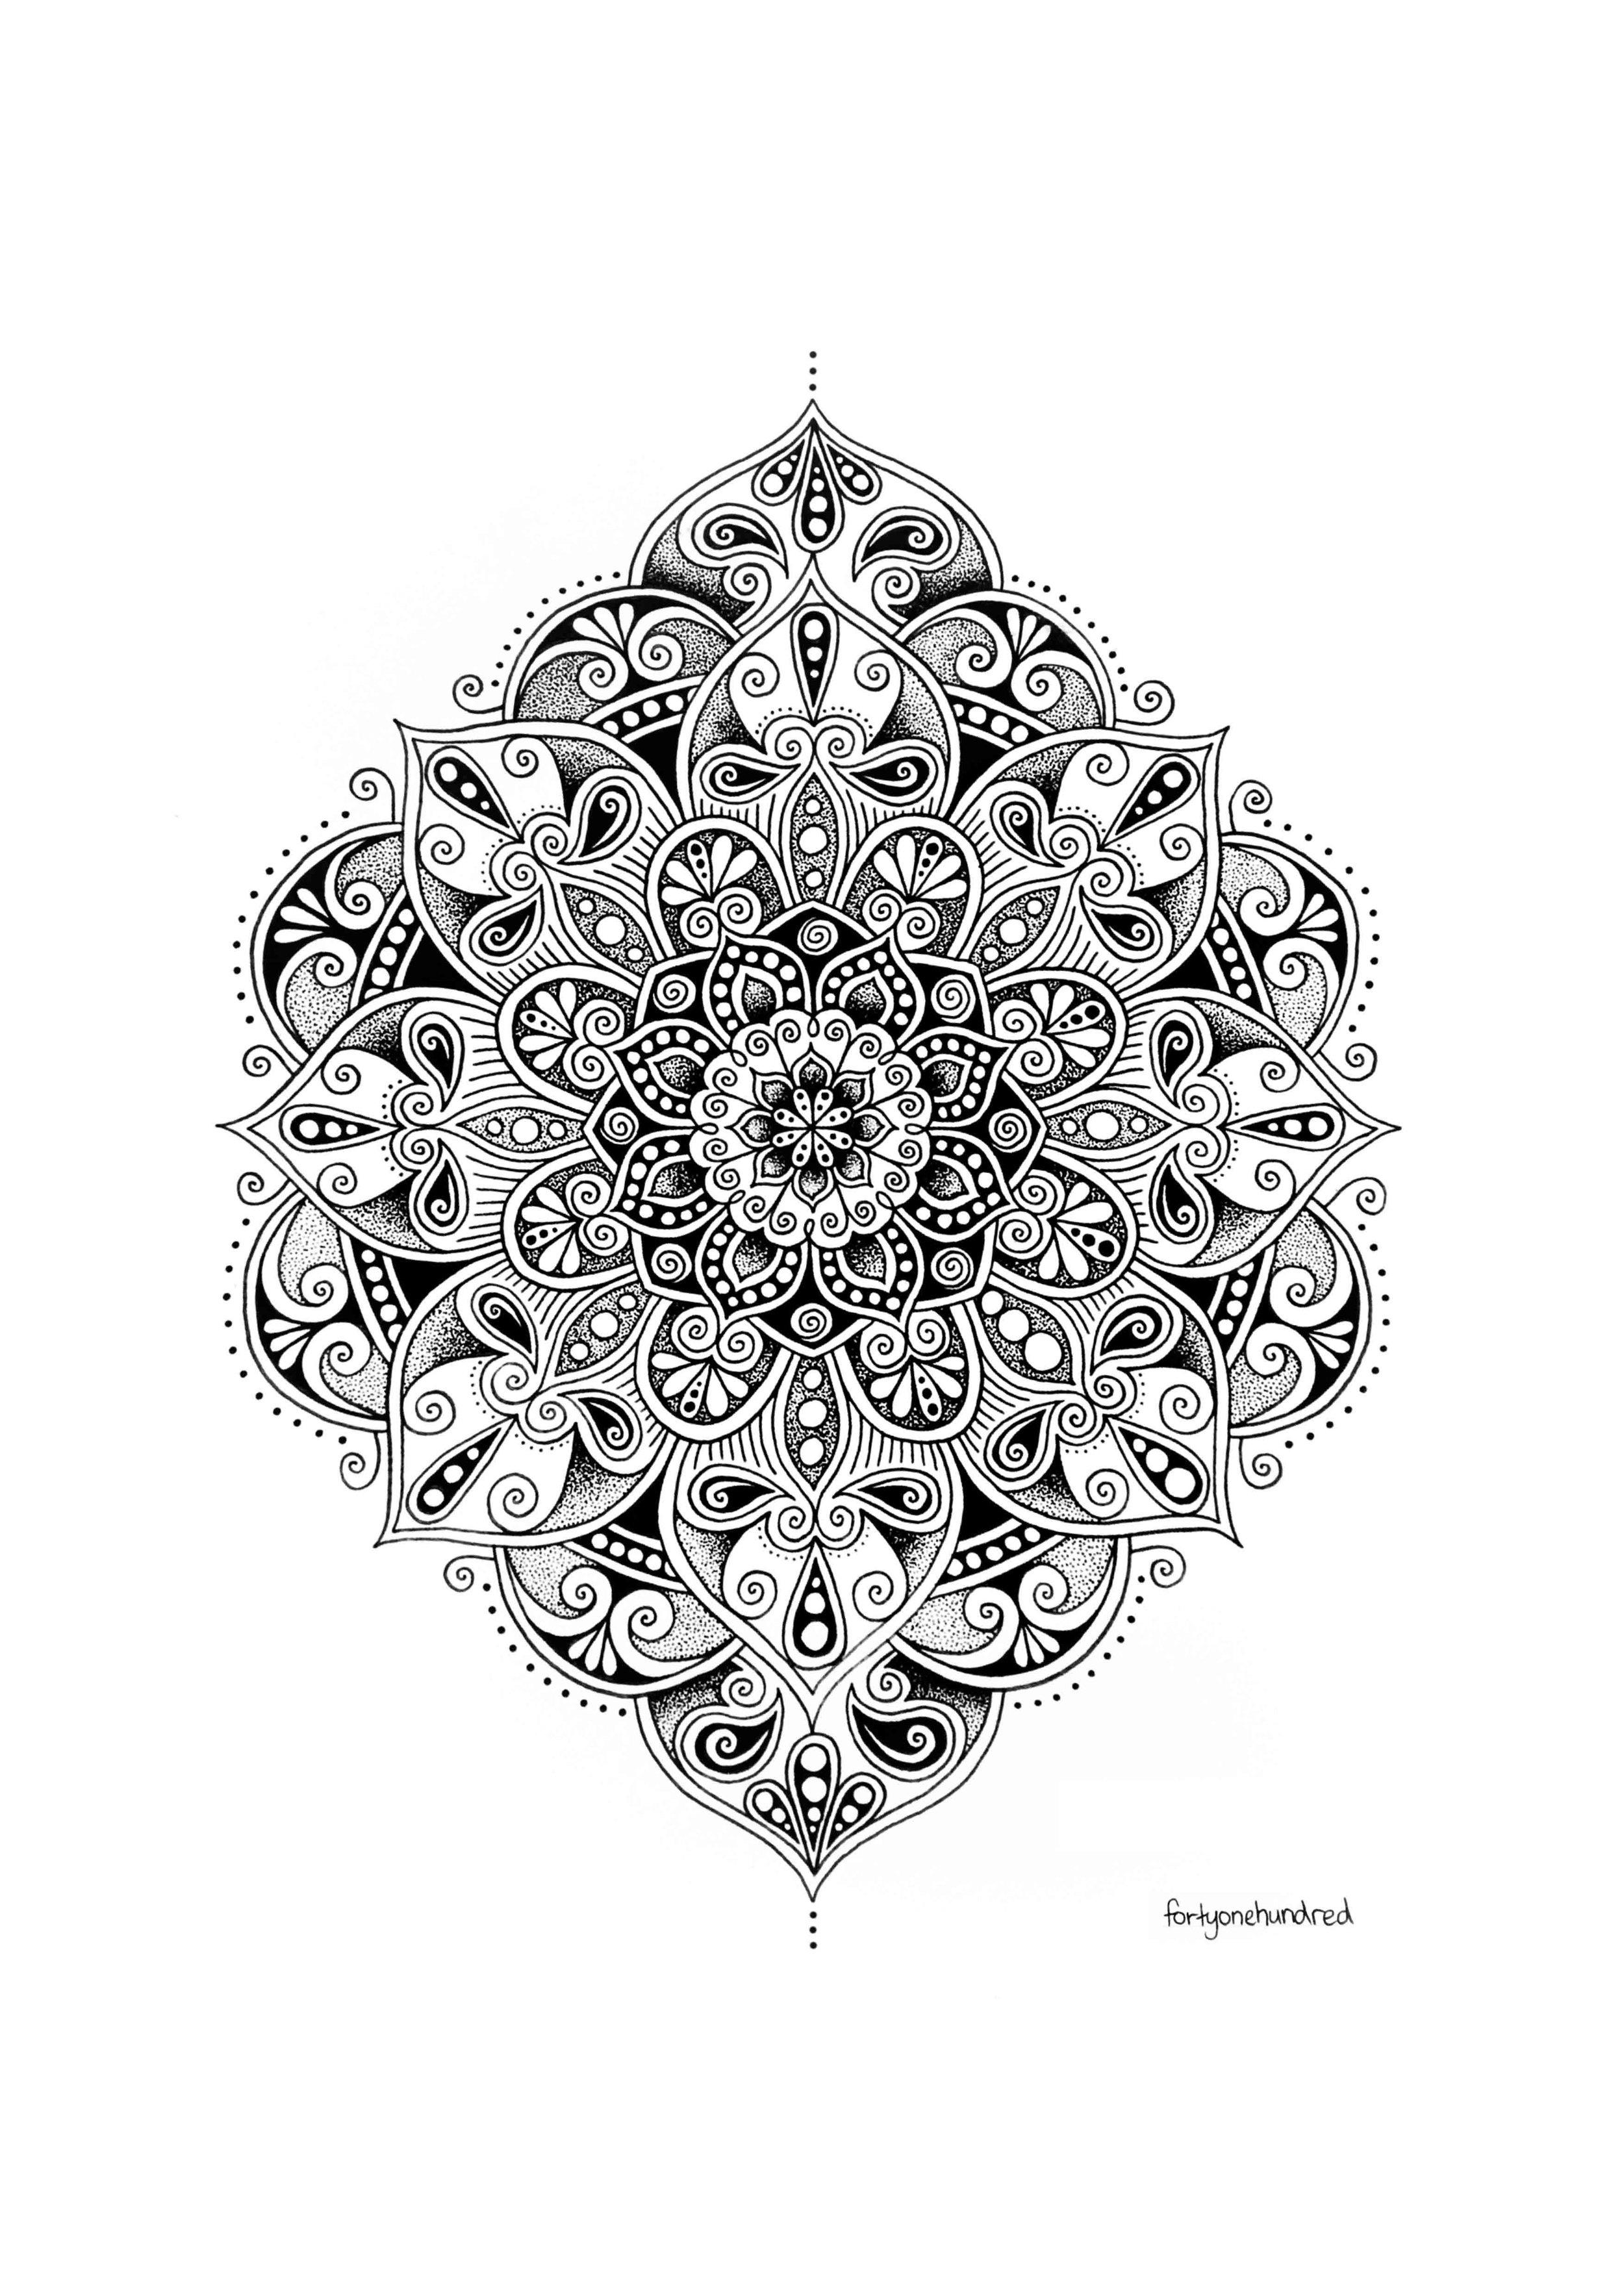 The Spring Mandala - fortyonehundred - A3.jpg